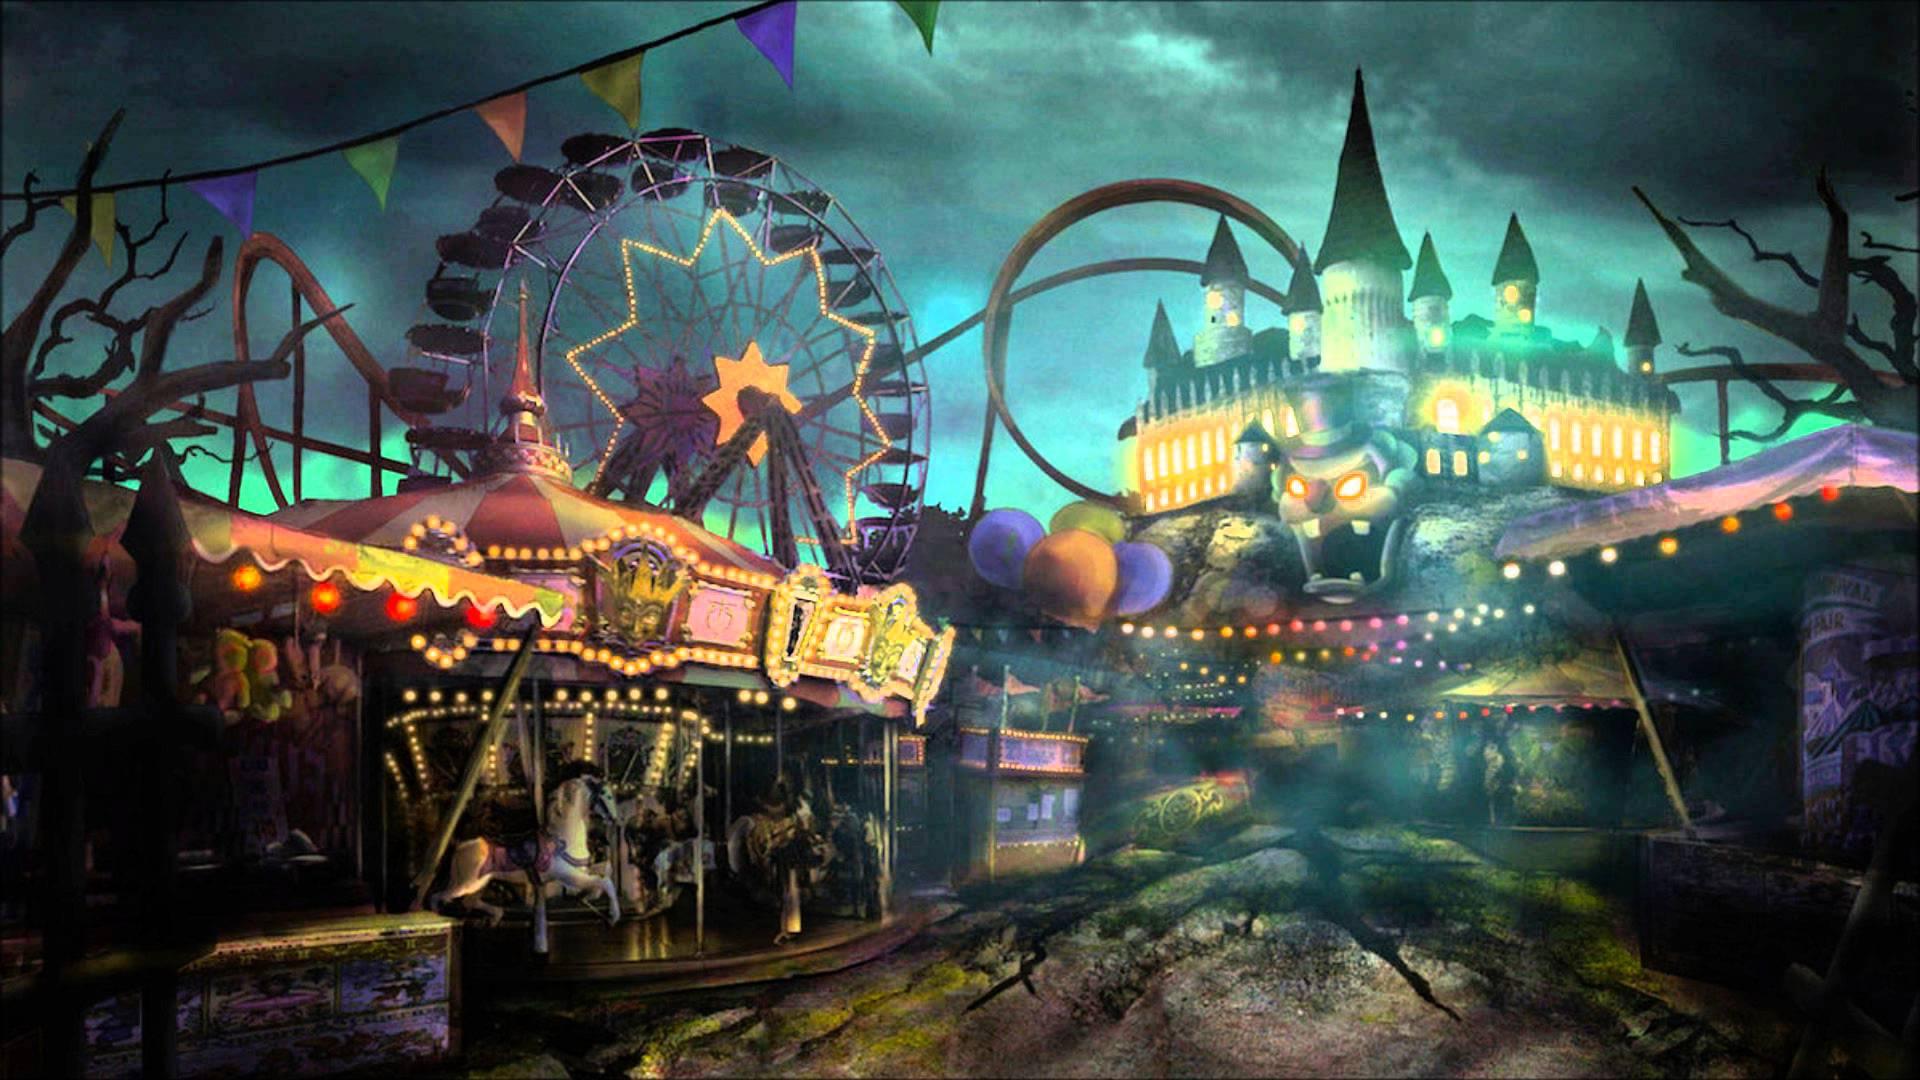 Theme Park Wallpapers 7 Rianfil 1920x1080